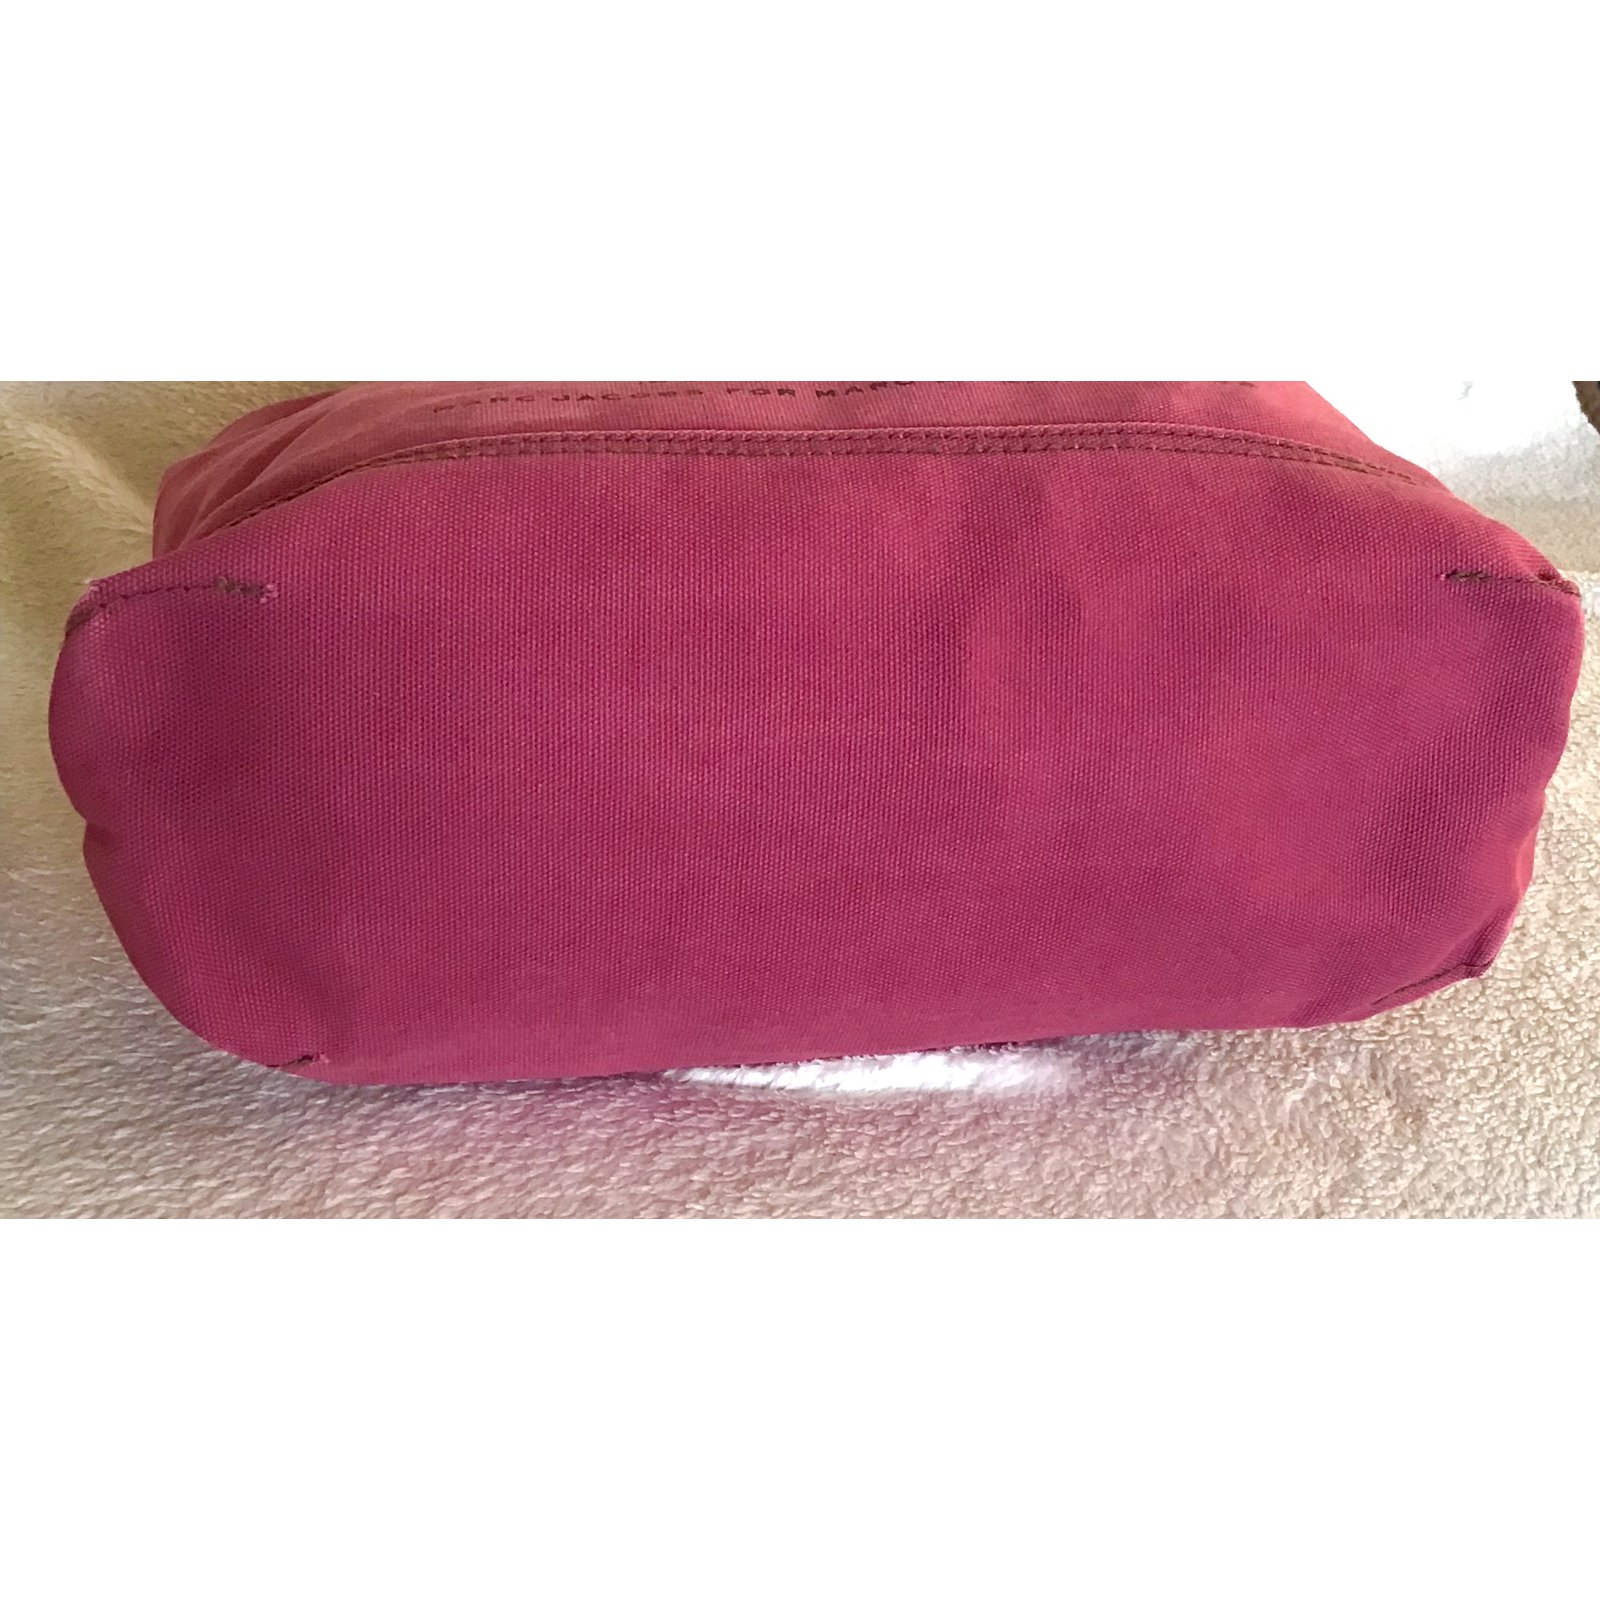 da332ab648c7 Facebook · Pin This. Marc by Marc Jacobs Handbags Handbags Cloth Pink ref. 108278